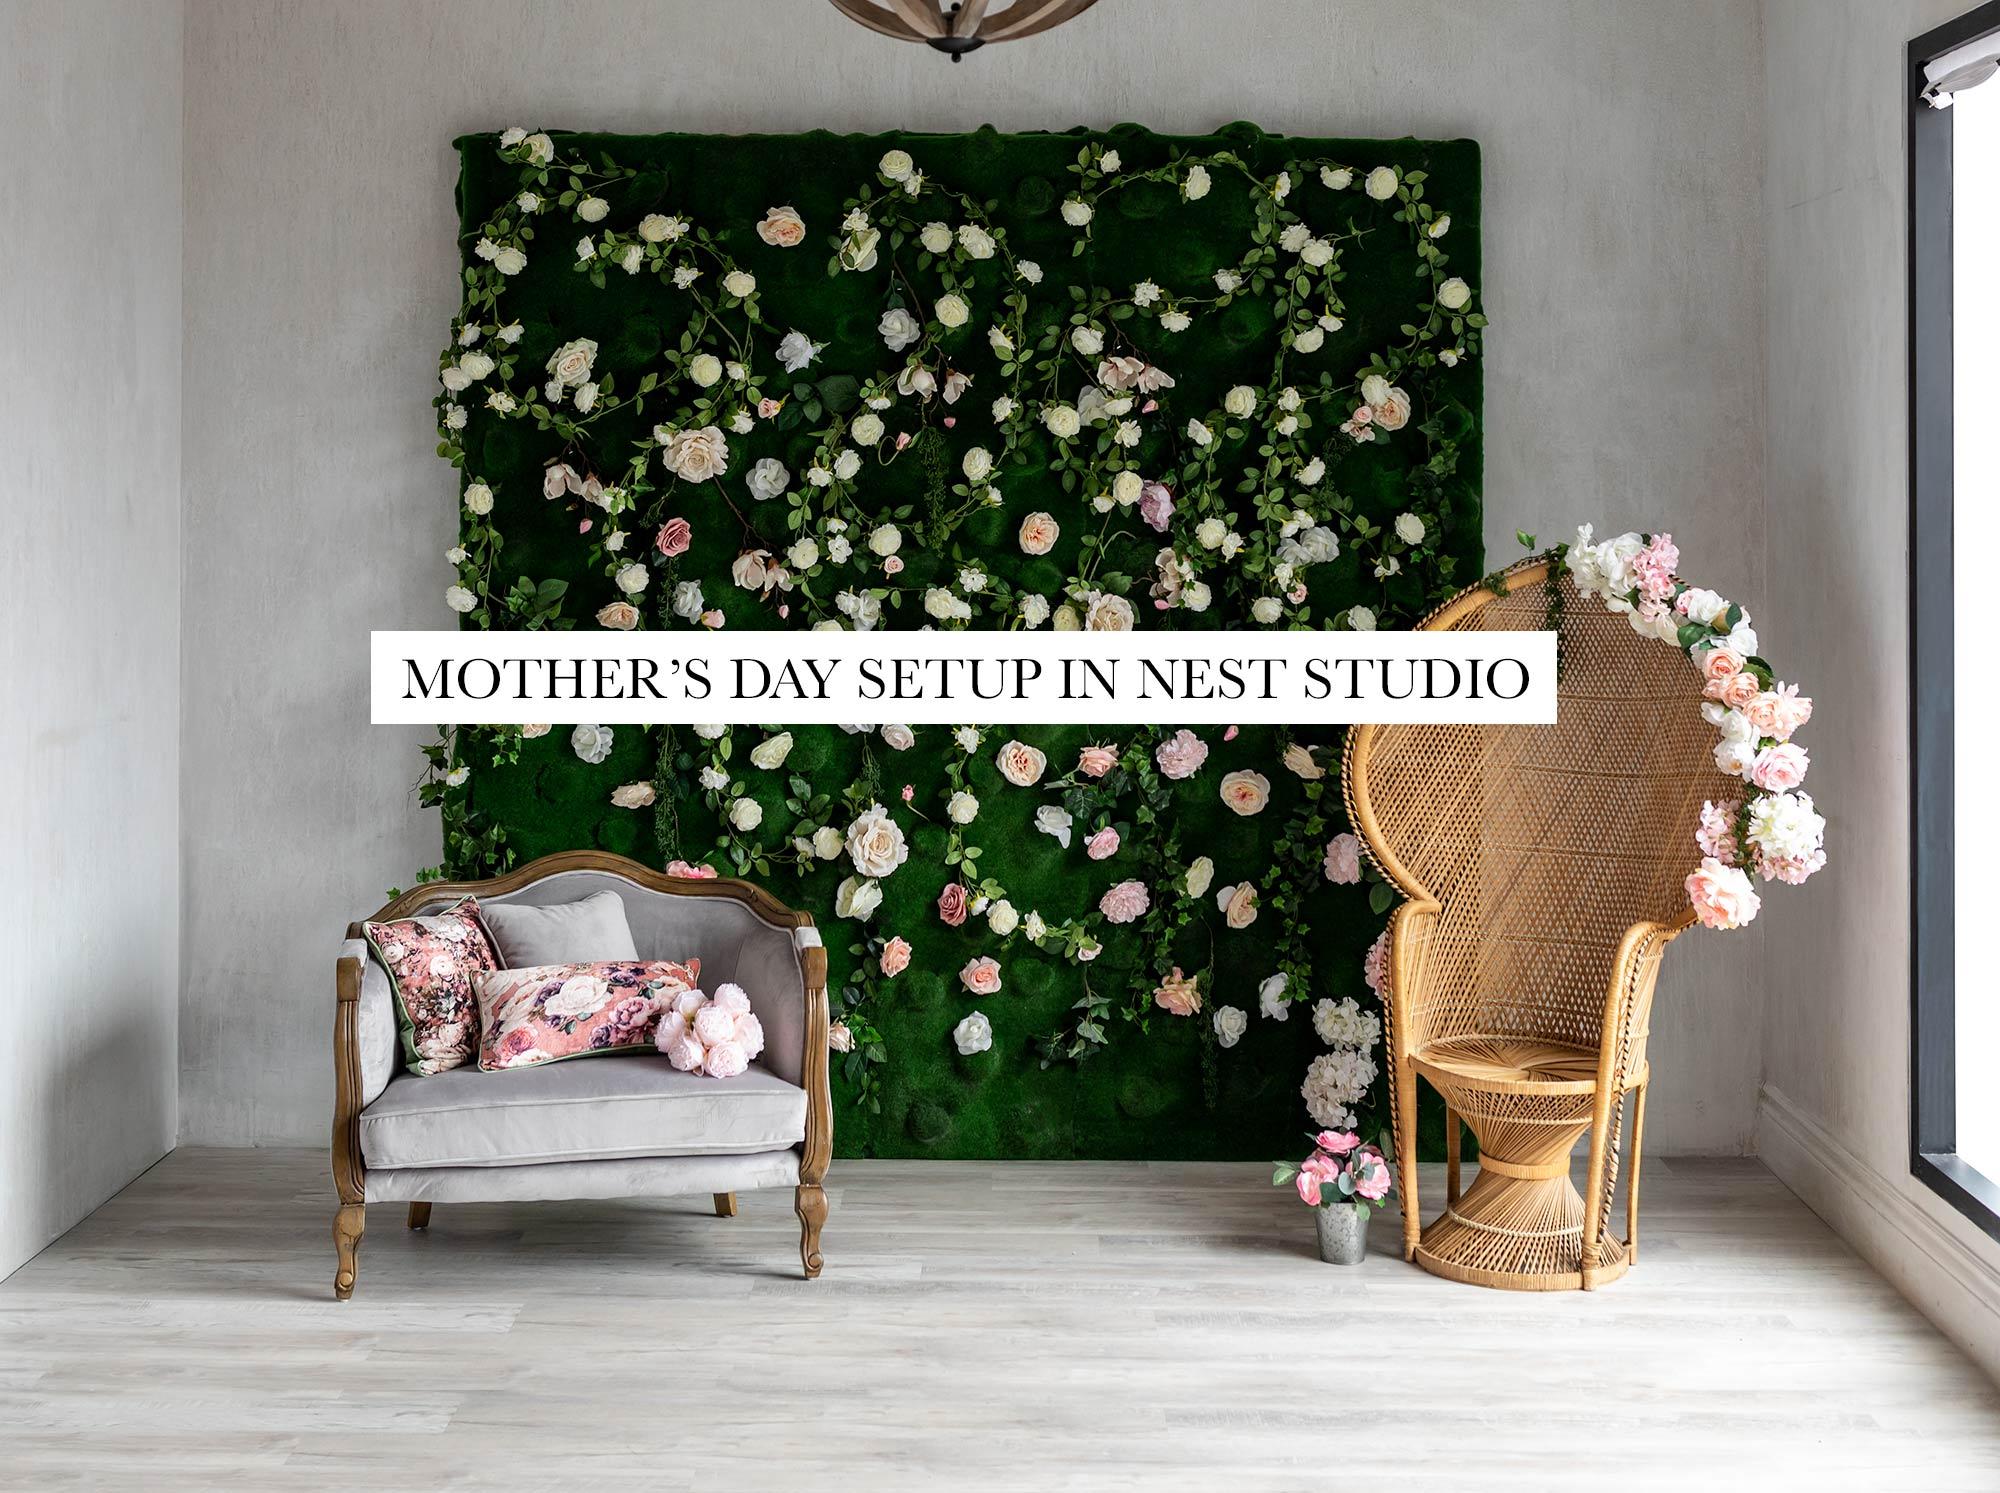 Studio Setup for Mother's day